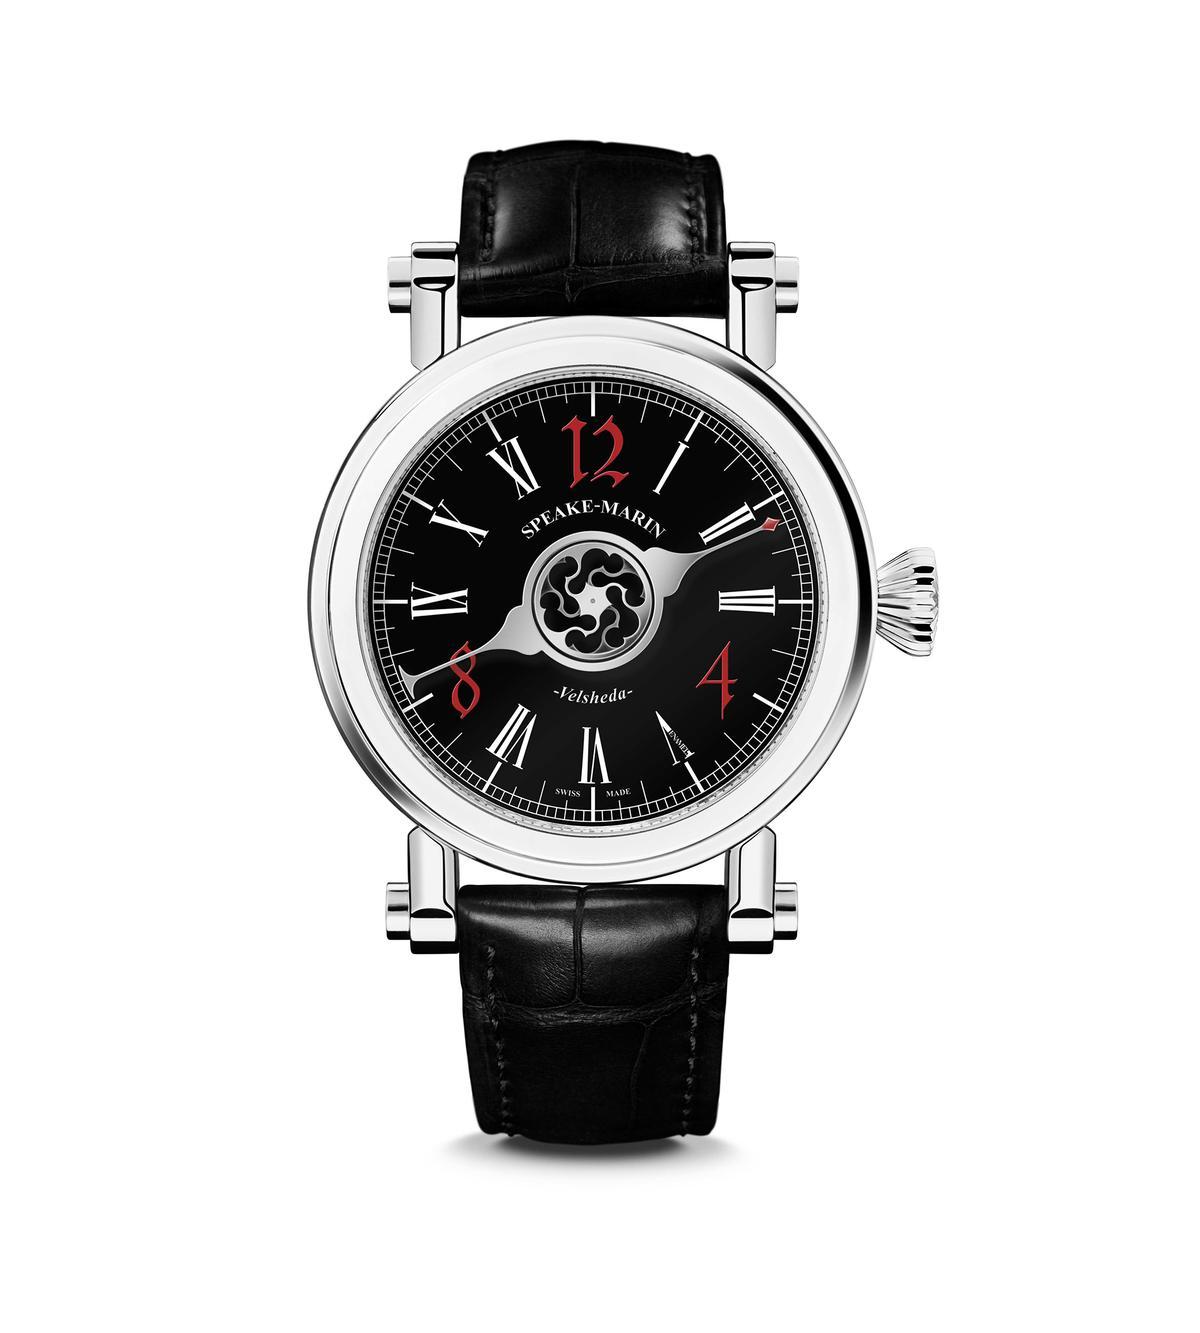 SPEAKE-MARIN Black Velsheda Gothic,可以算是展內的「入門款」。時標刻度的樣式與配色,以及錶耳錶冠的造型非常有趣。定價NT$492,000,全球限量16只。